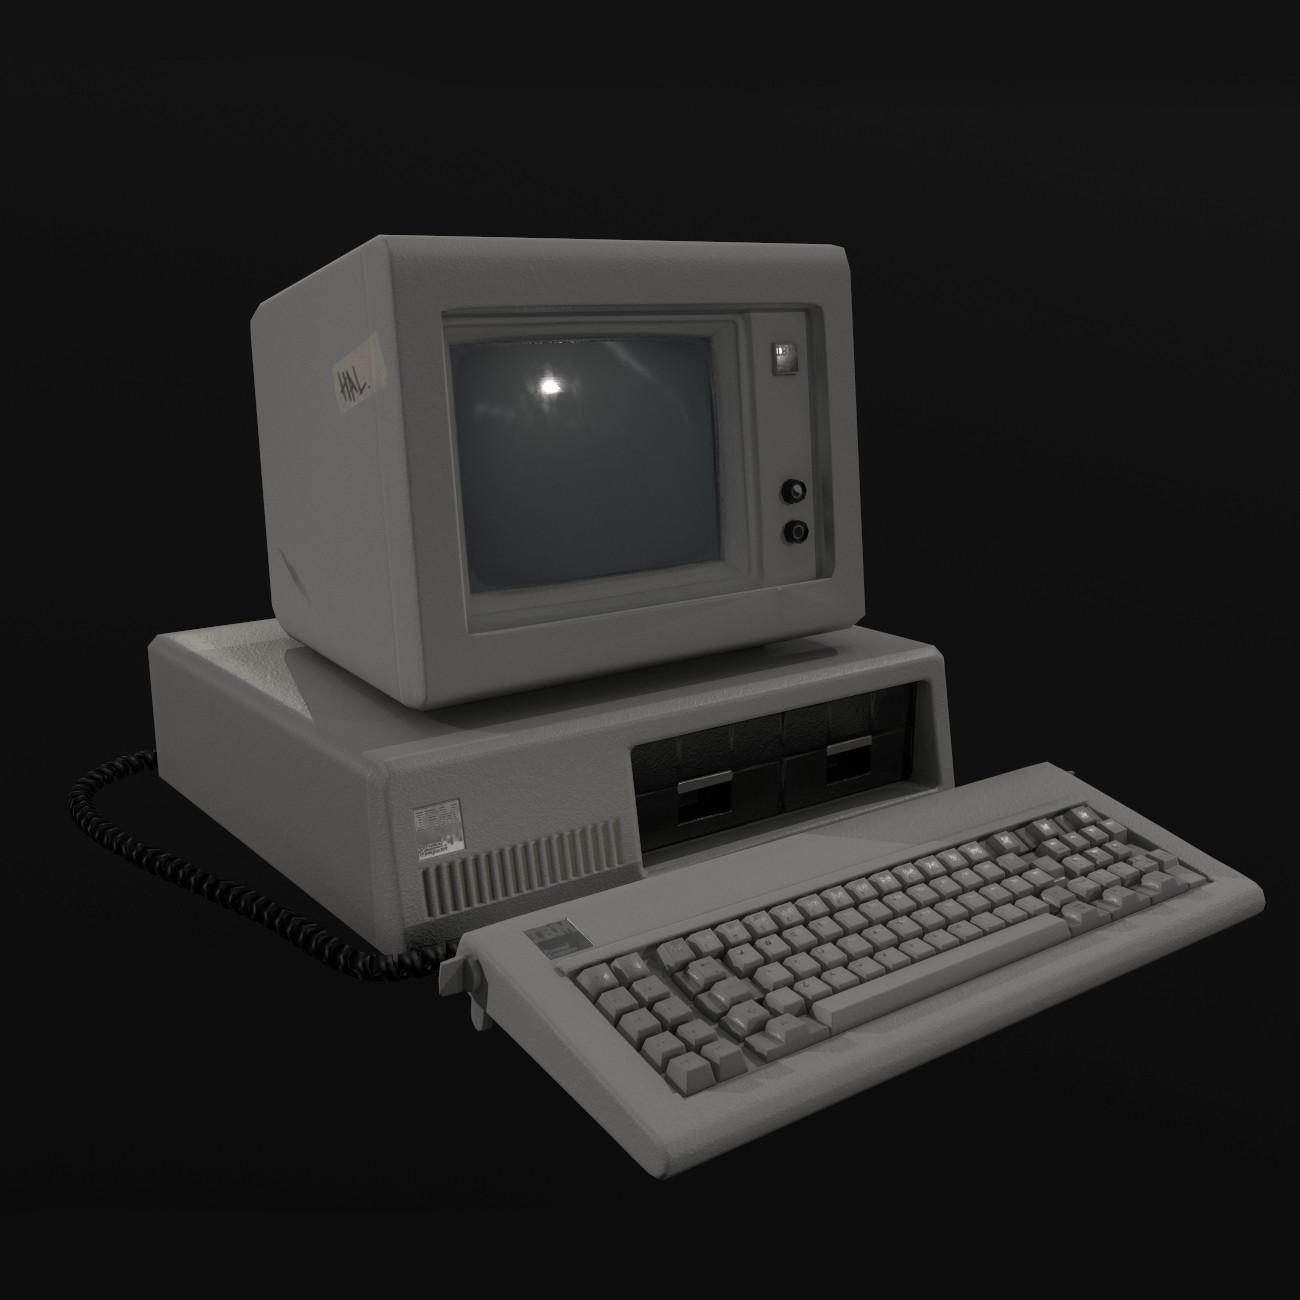 IBM 5150 Prop